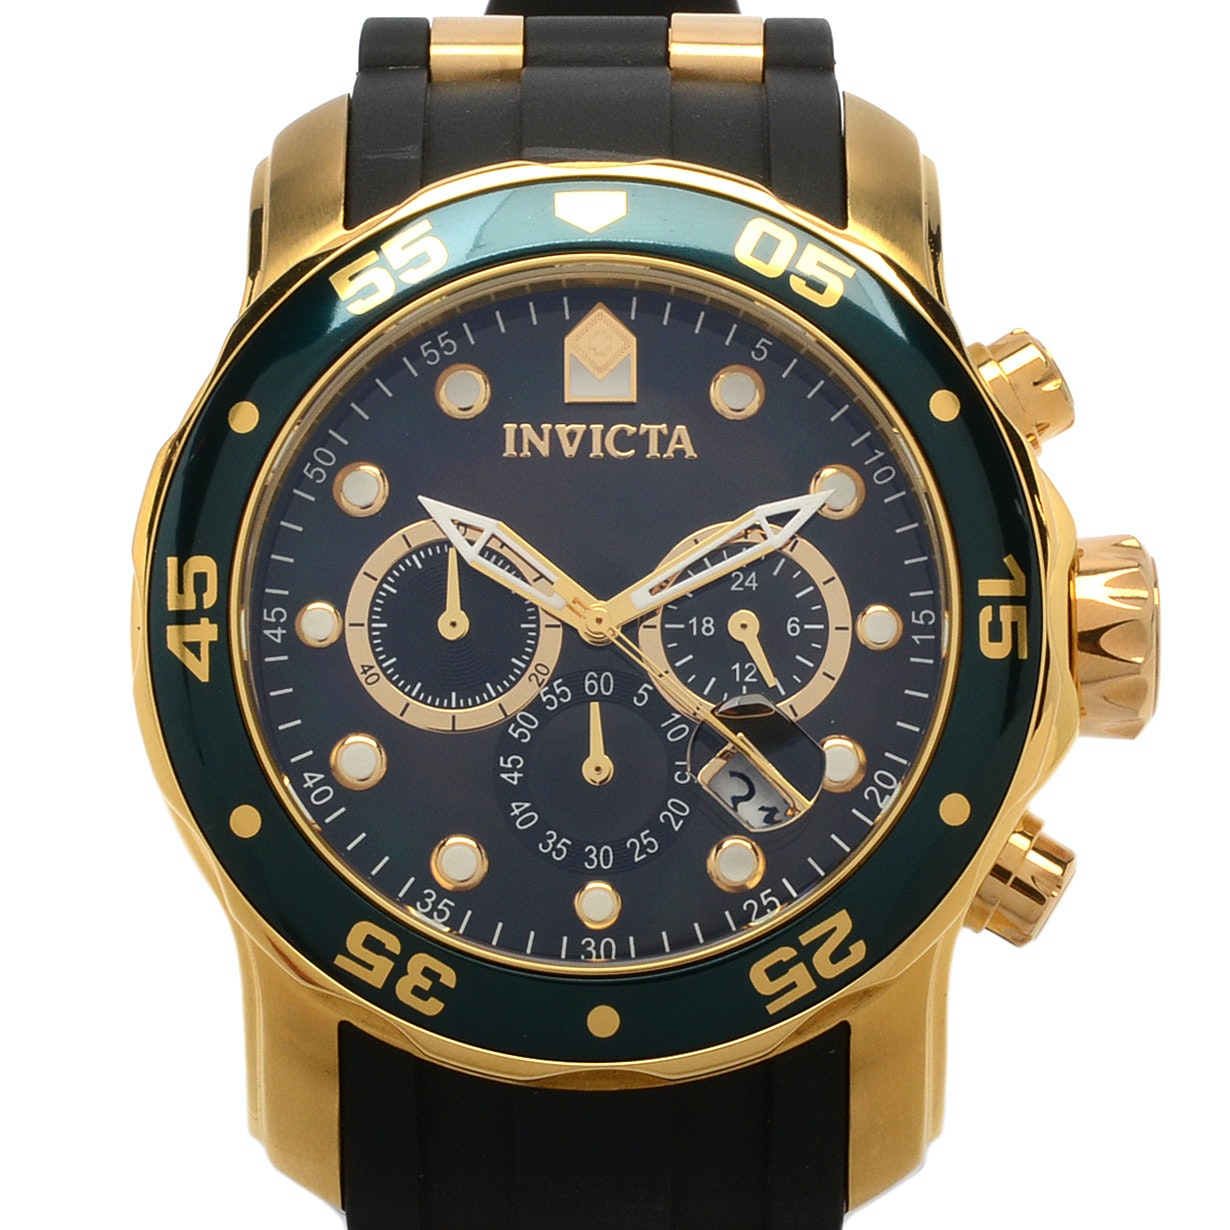 Invicta Pro Diver Chronograph Wristwatch